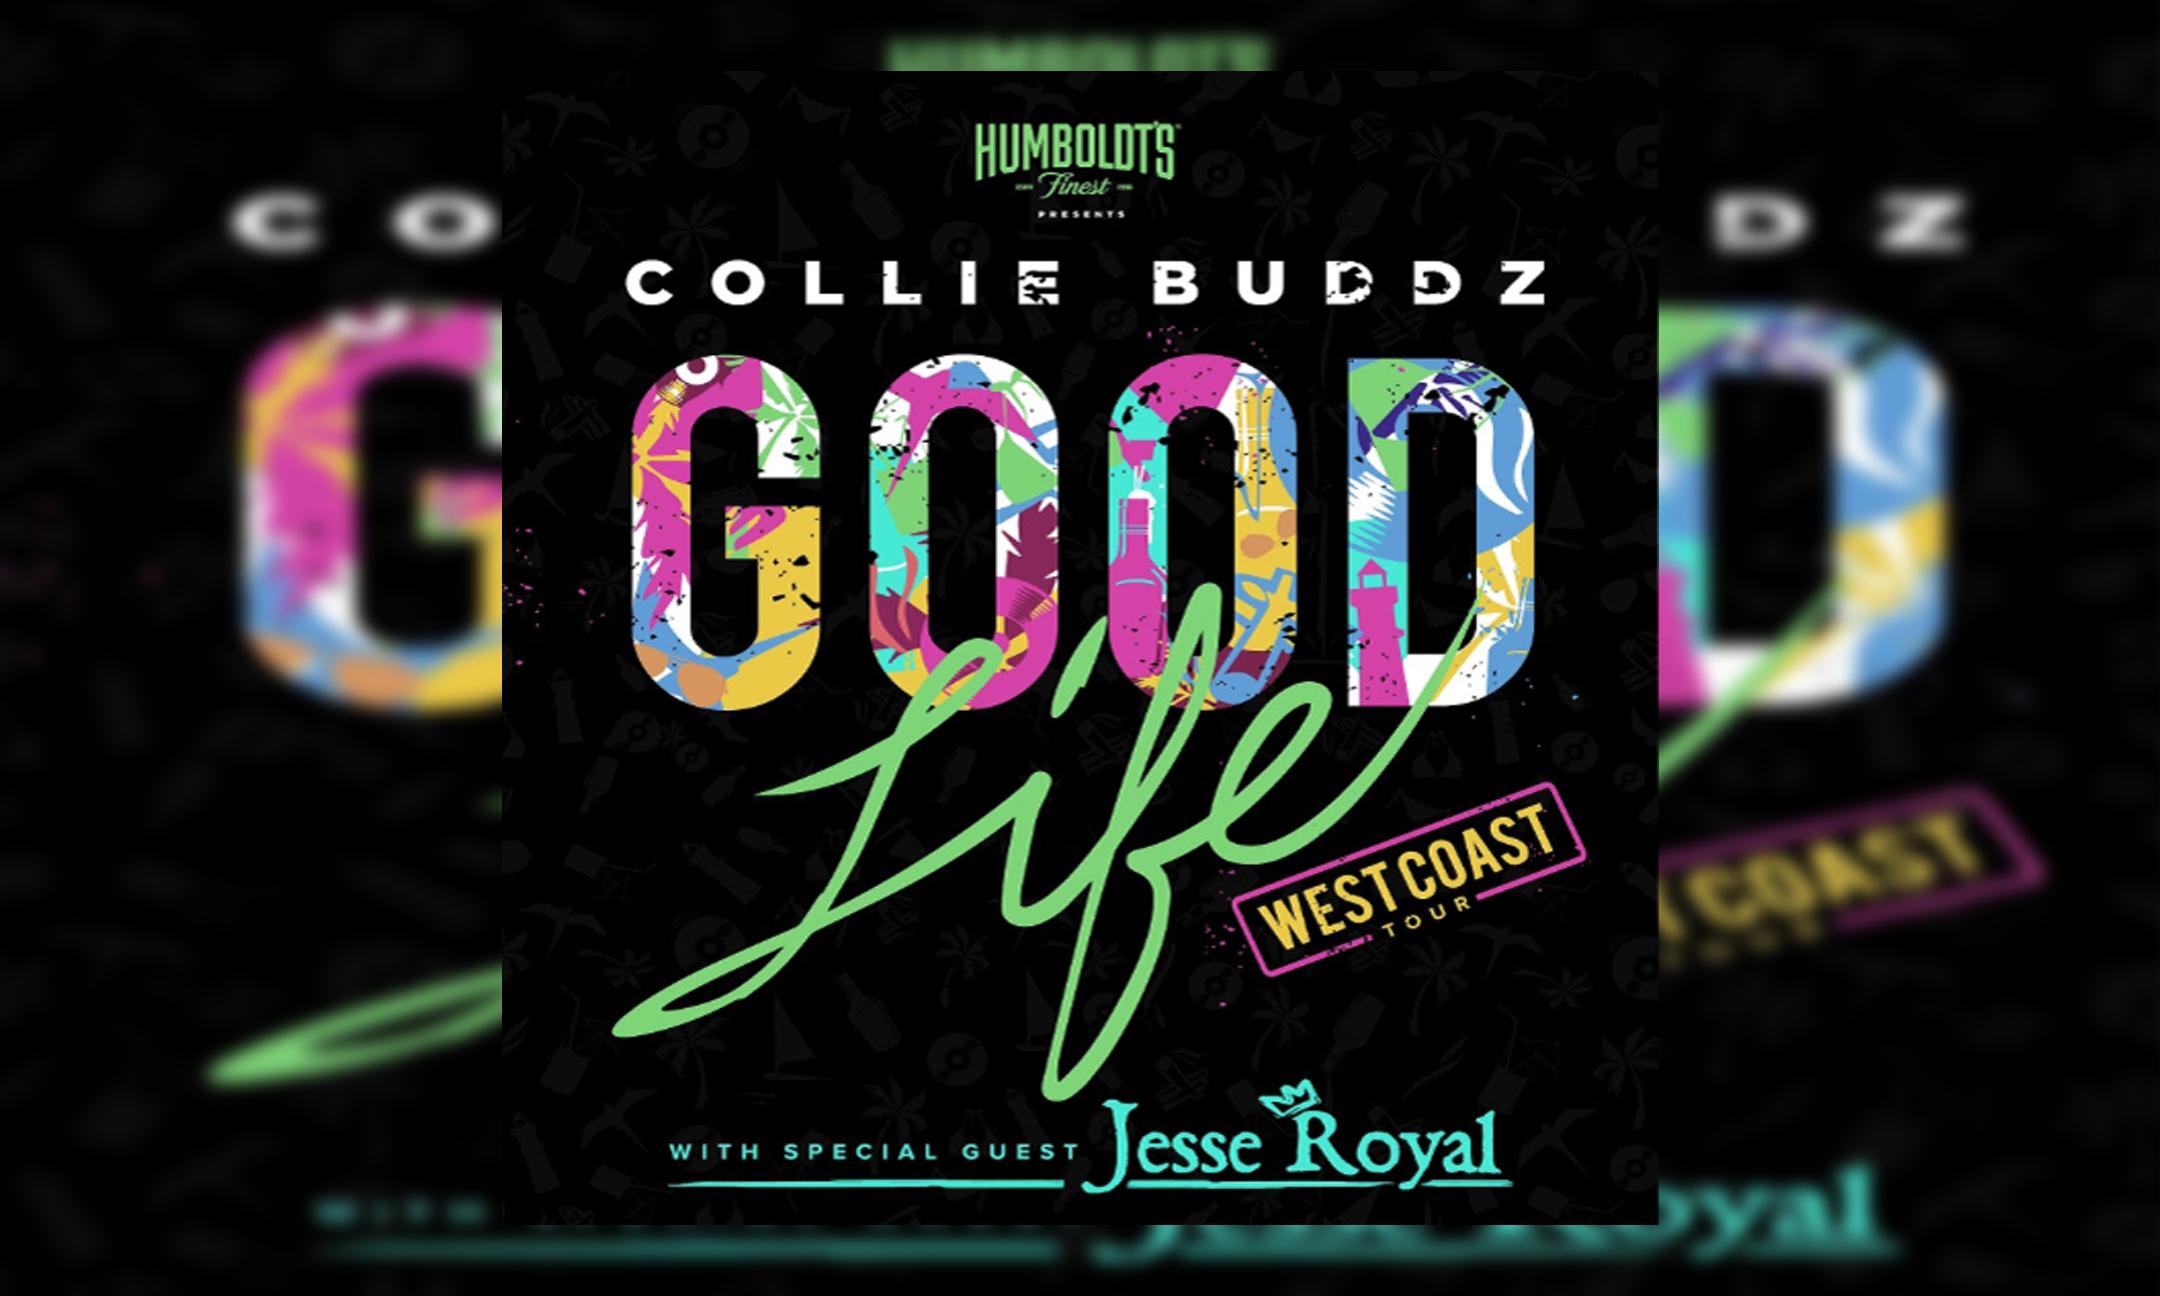 Collie Buddz Announces 'Good Life' West Coast Tour Presented by Humboldt's Finest!